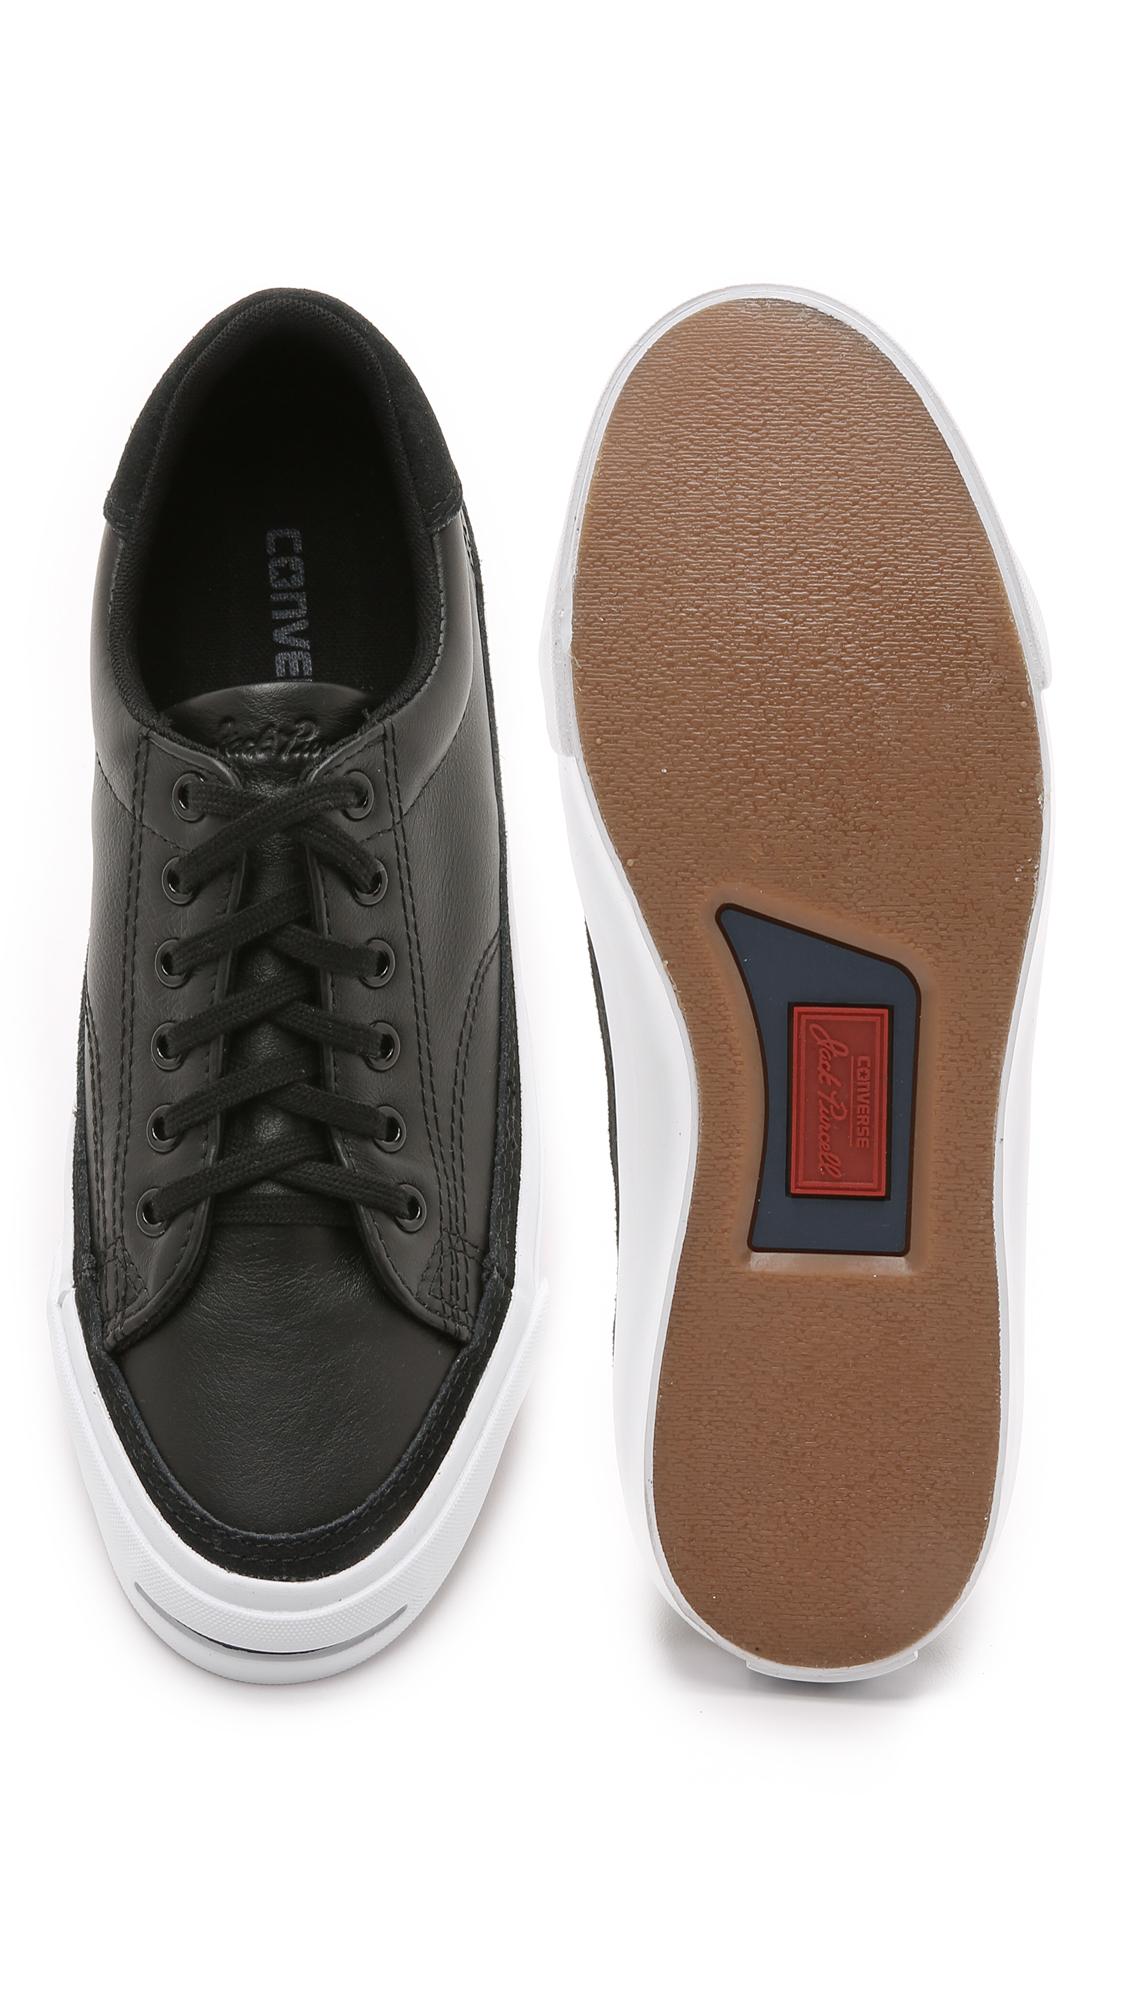 791f785c3138 ... australia converse jack purcell ii leather sneakers in black for men  lyst fba89 fe5aa